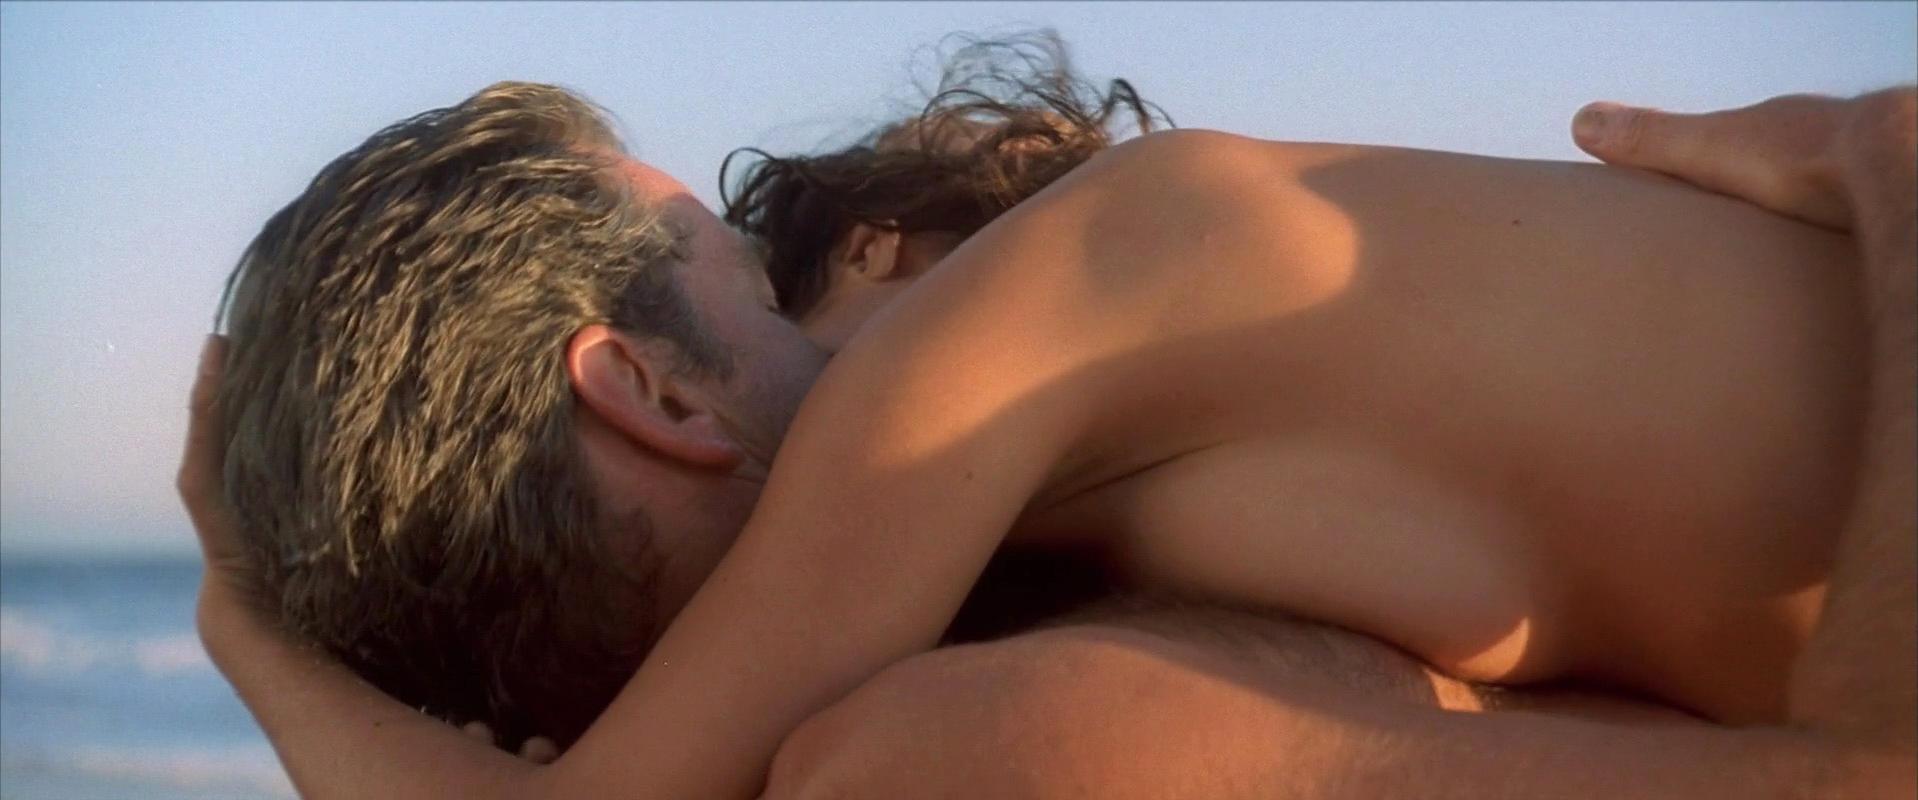 Salma Hayek sexy - After The Sunset (2004)